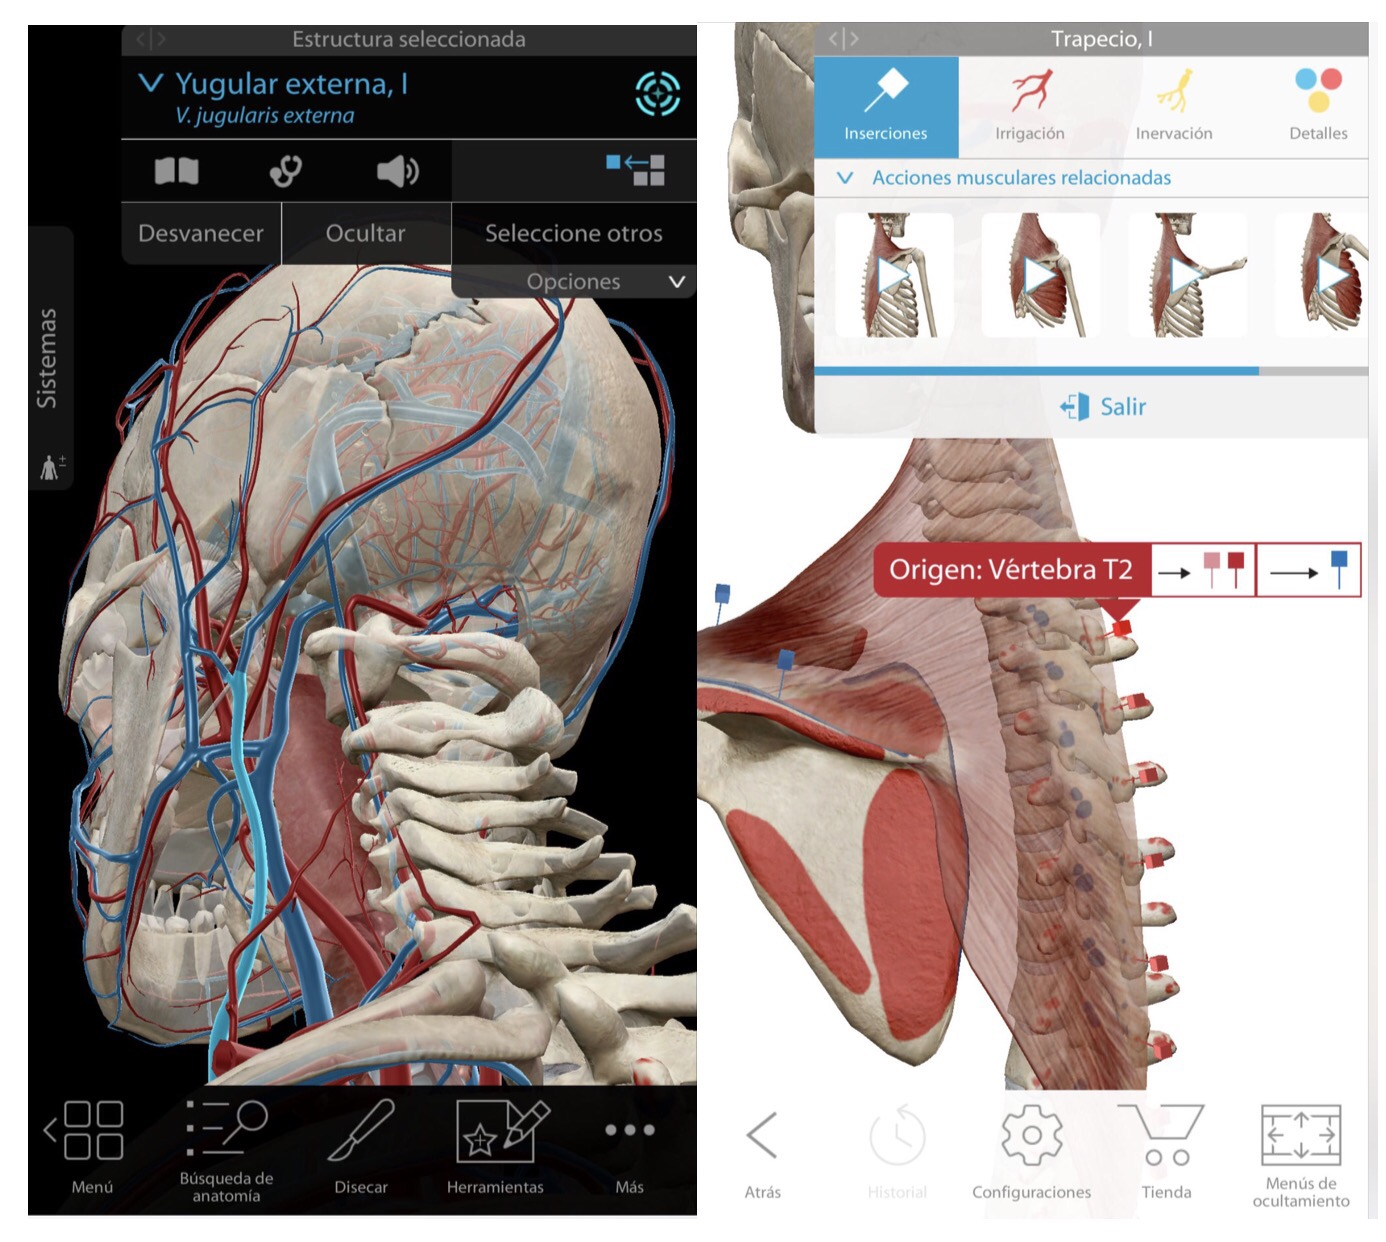 Lujoso Anatomía Aplicación Para Android Embellecimiento - Anatomía ...